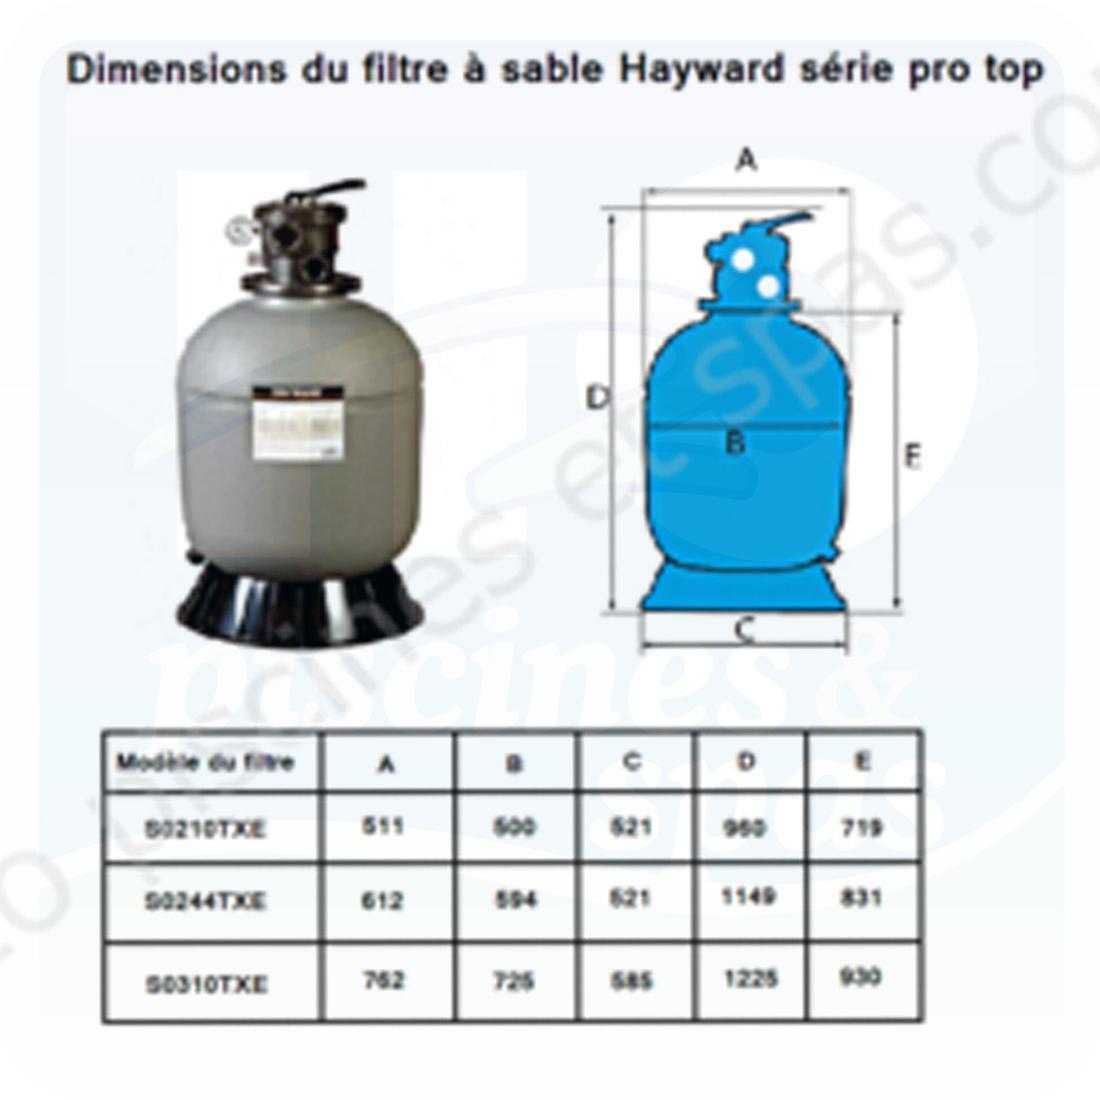 filtre sable hayward serie pro s0244txe vanne 1 1 2. Black Bedroom Furniture Sets. Home Design Ideas